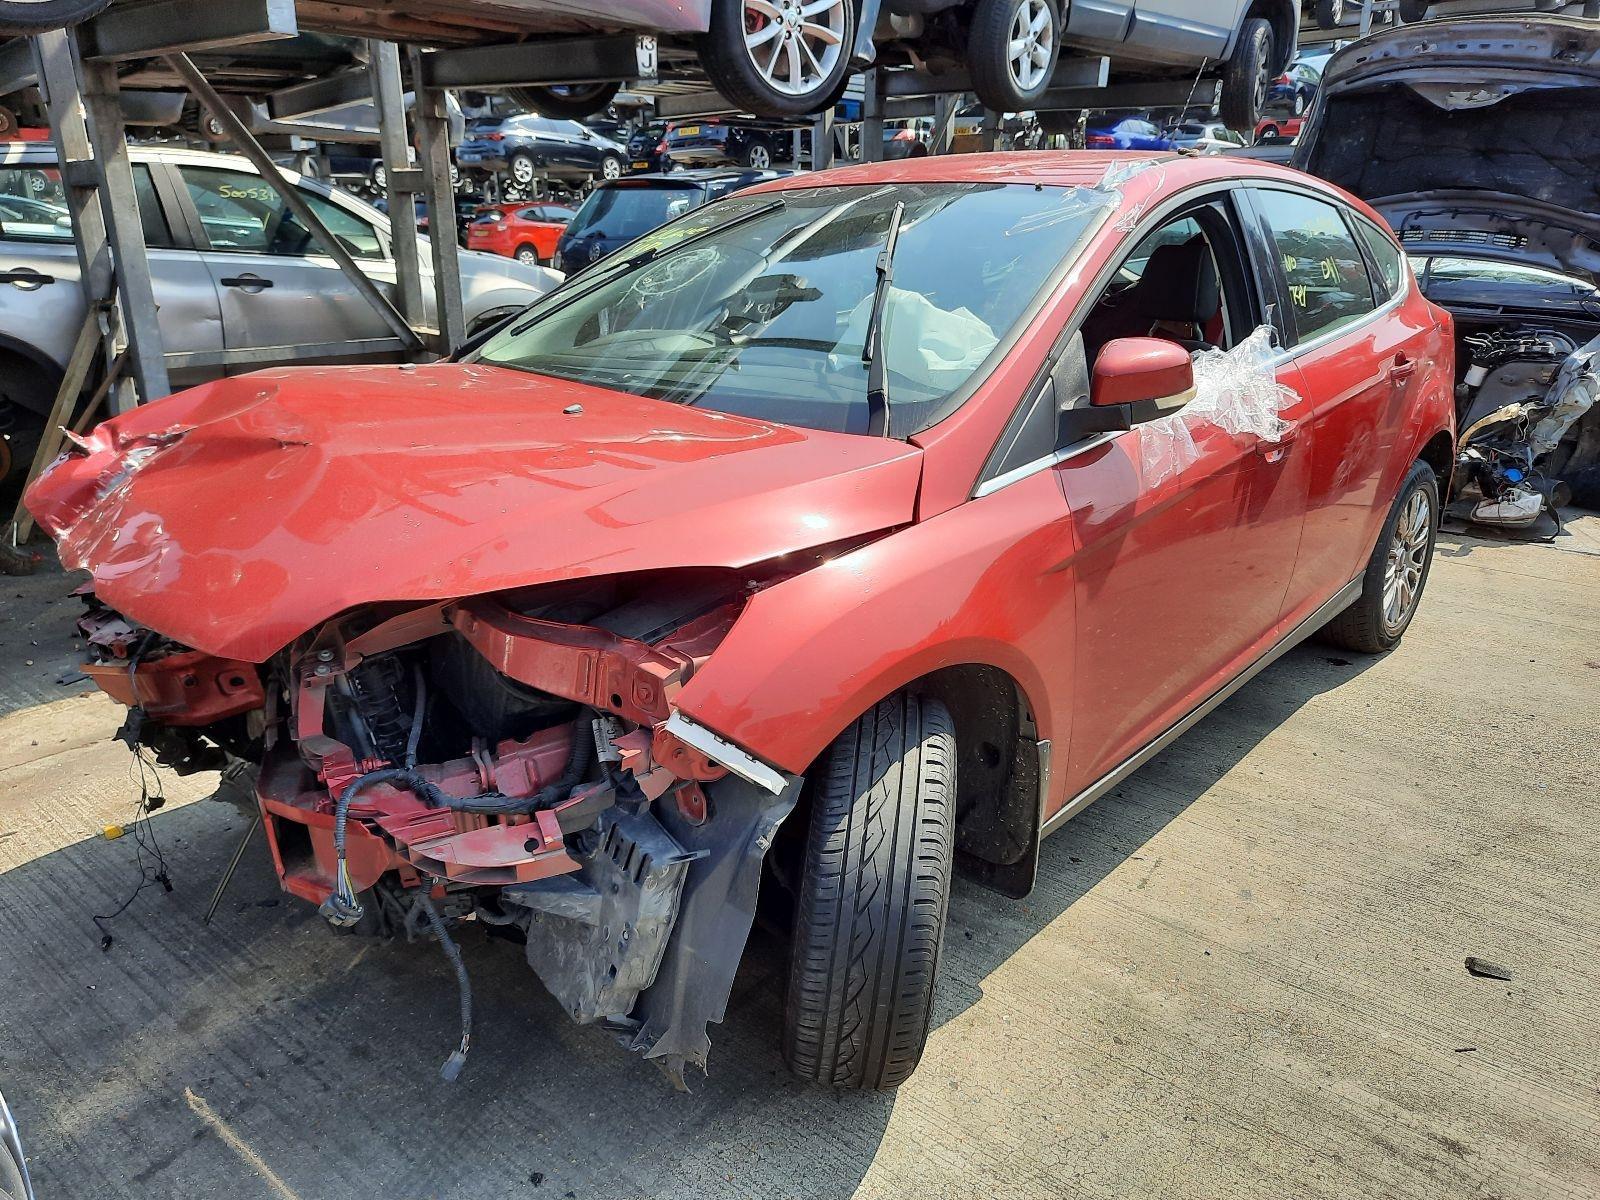 Ford Focus 2011 To 2014 Titanium 5 Door Hatchback